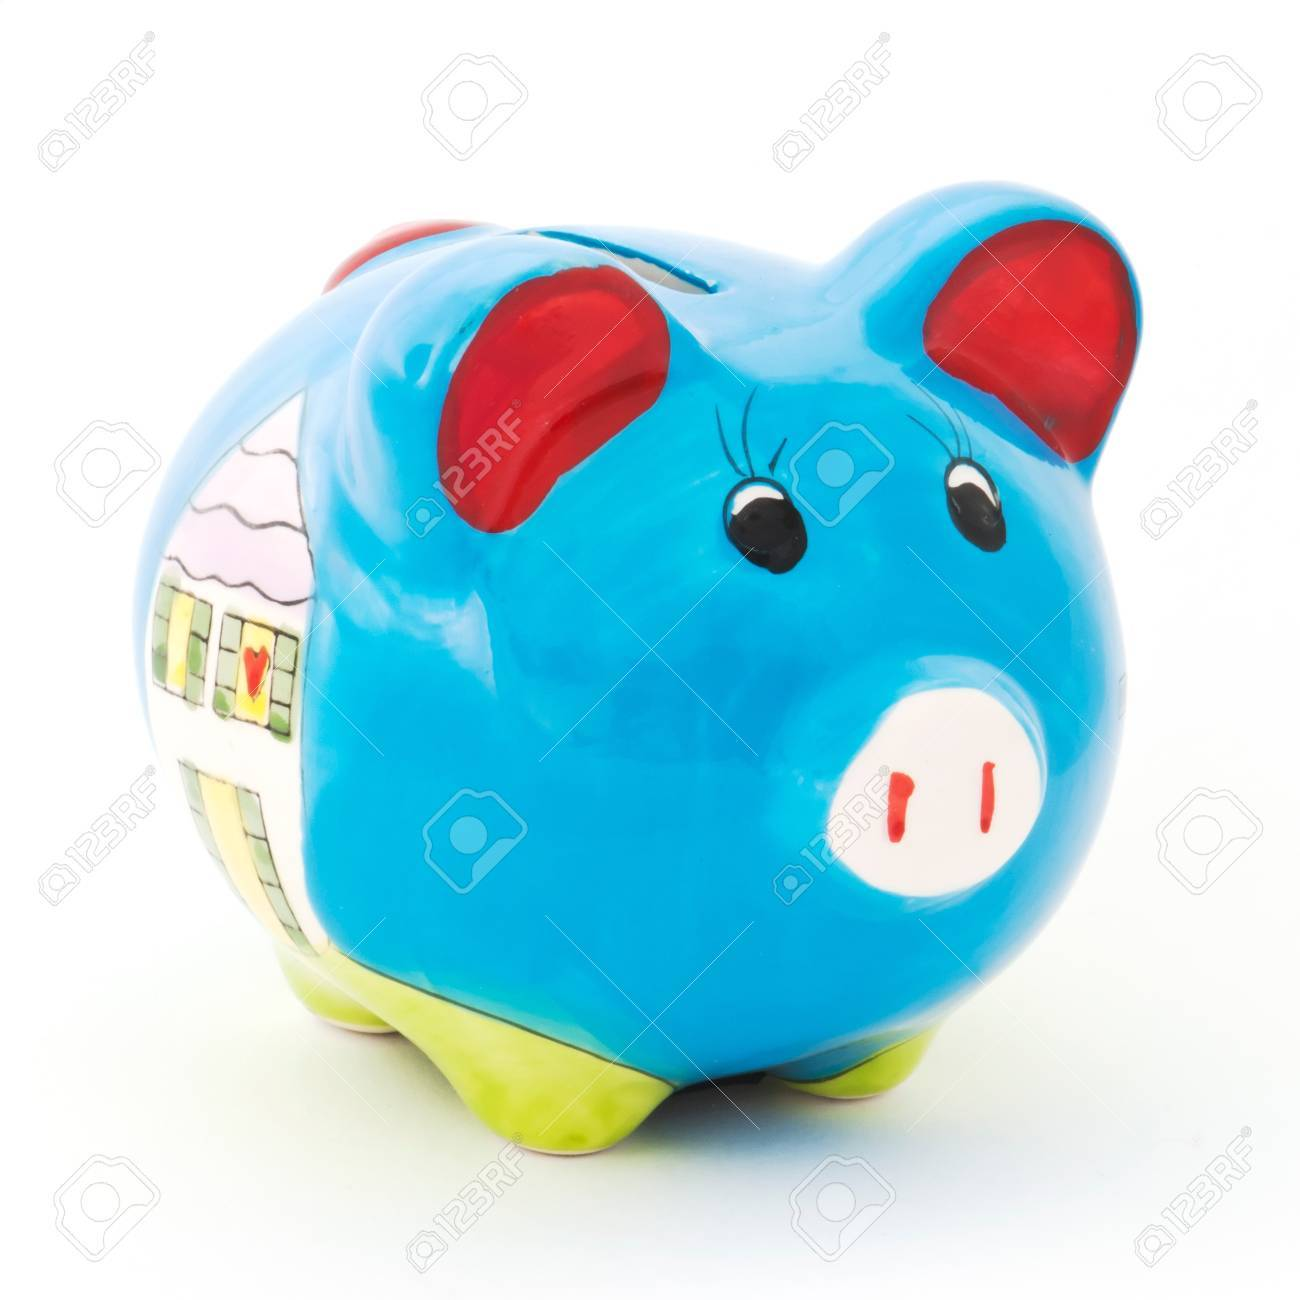 Ceramic pig box on white background - 13321266